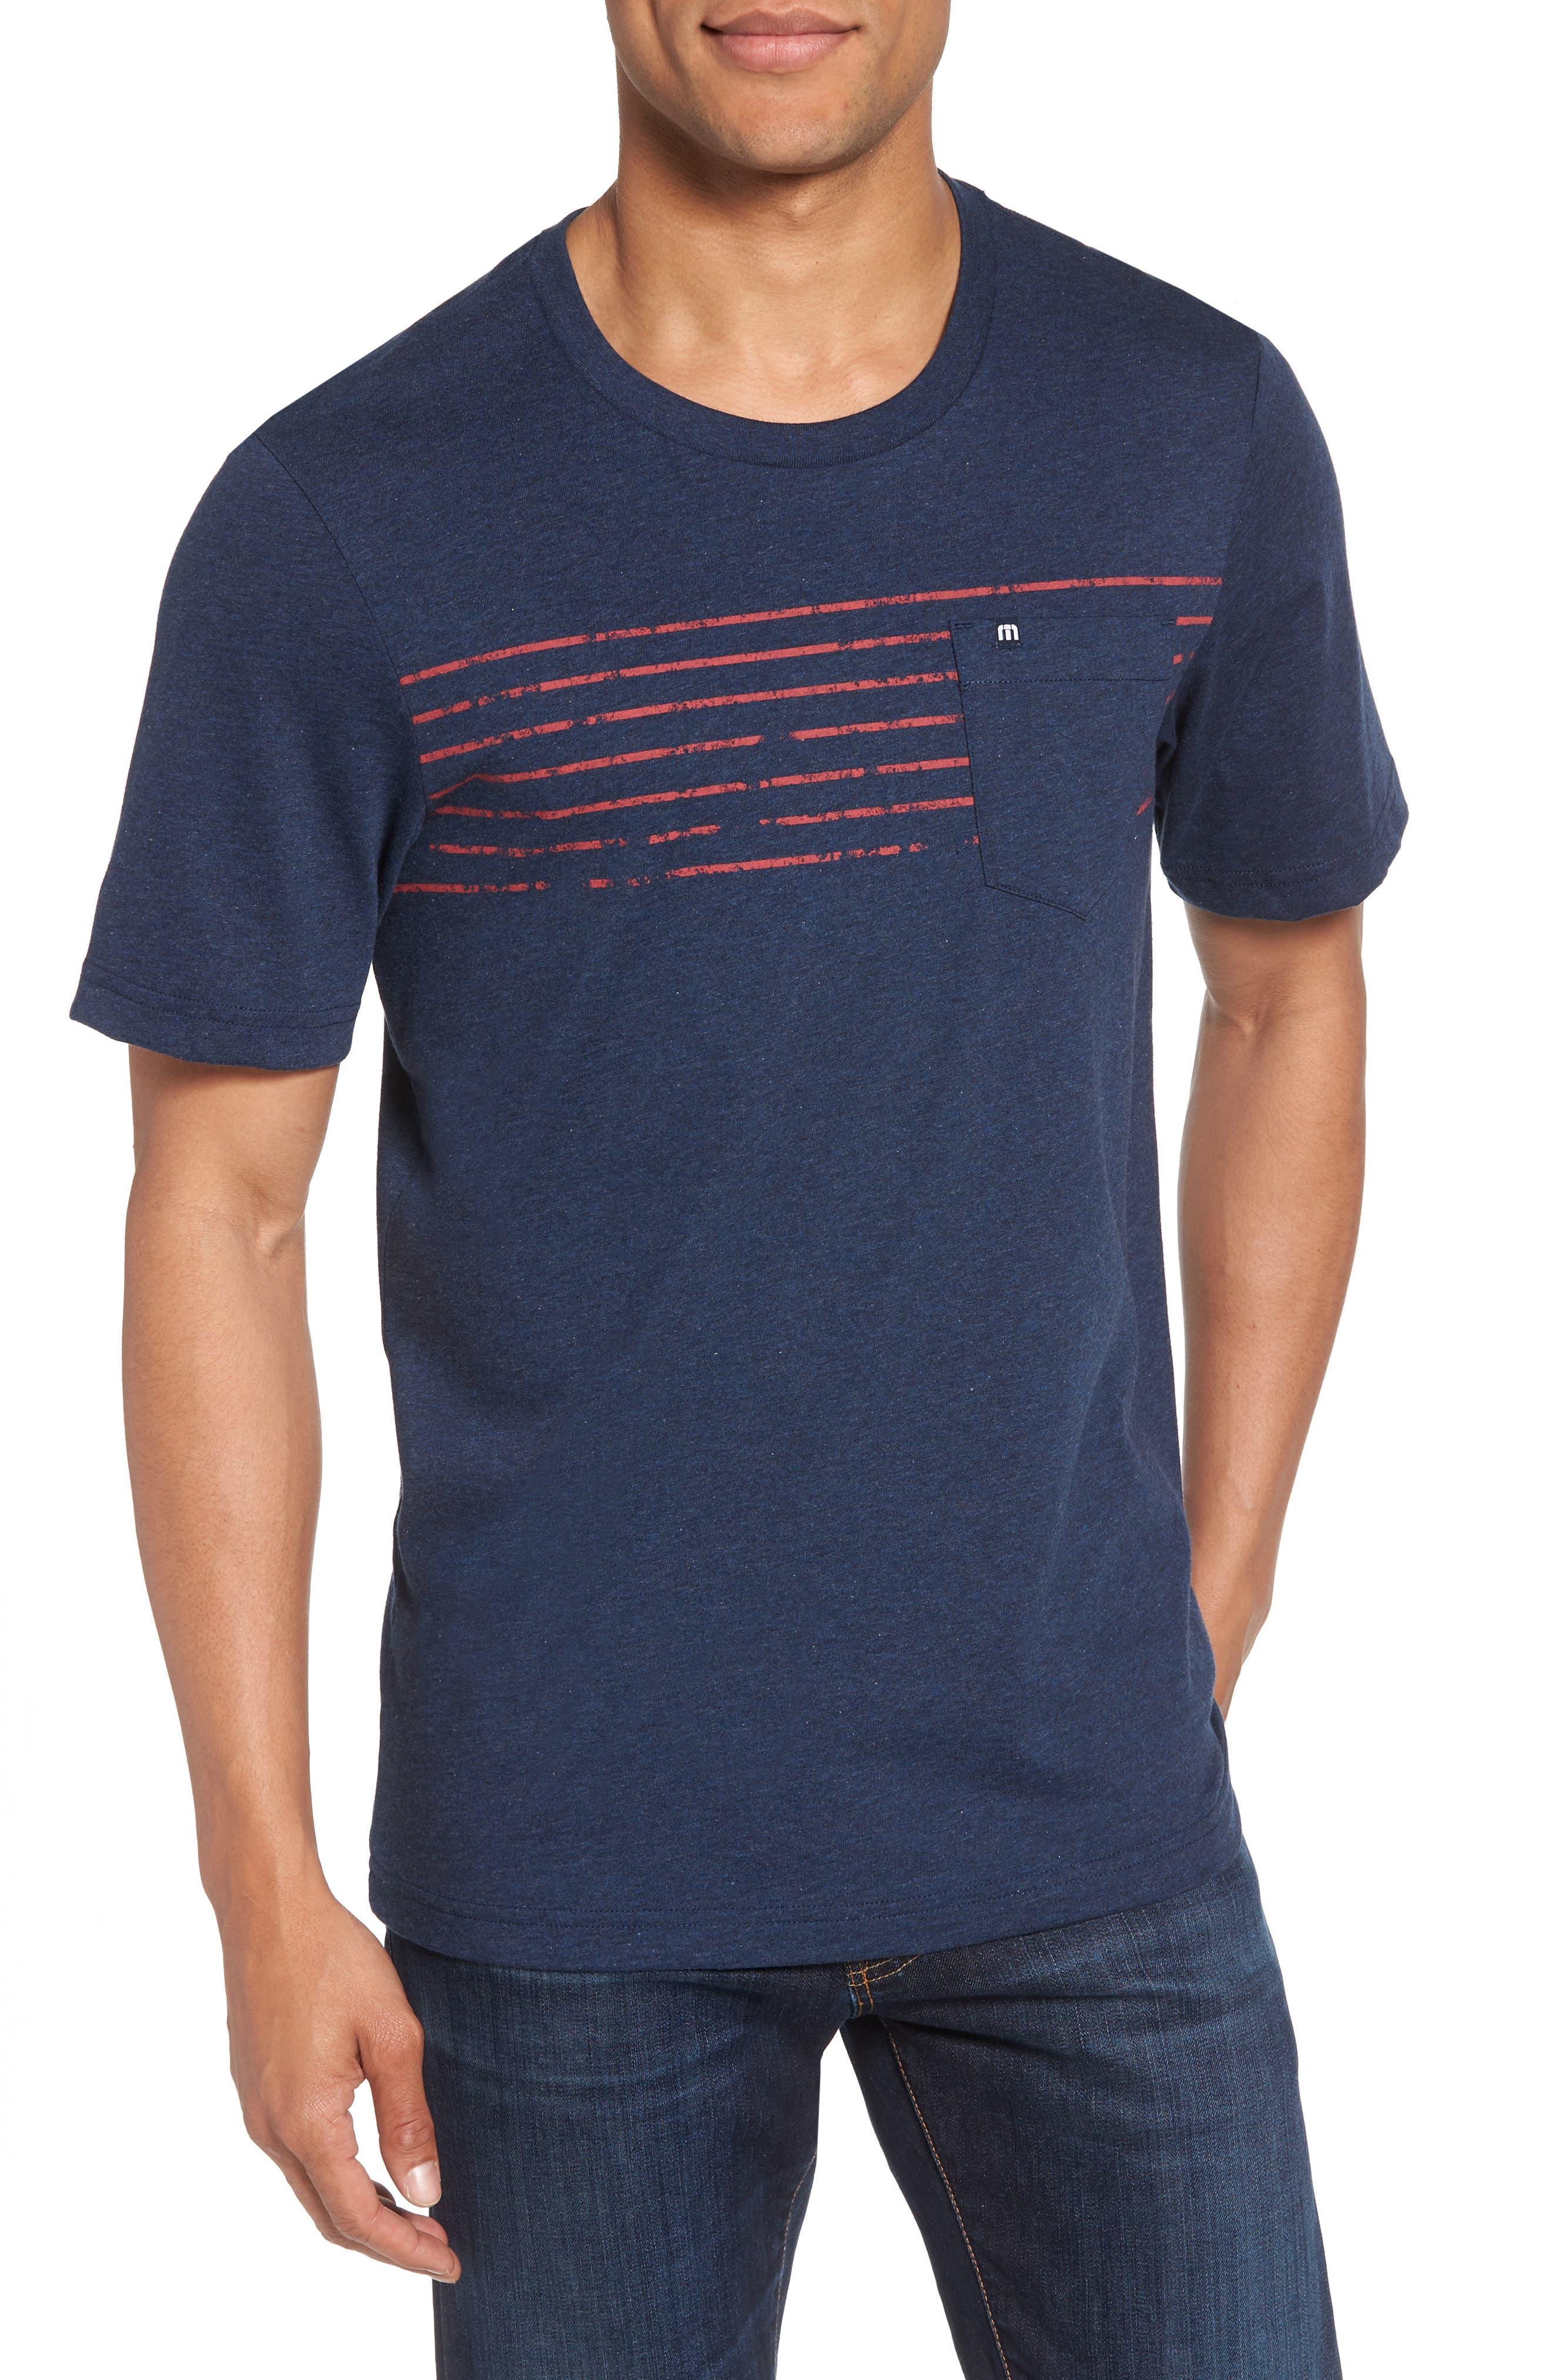 Bogue Pocket T-Shirt,                             Main thumbnail 1, color,                             Heather Blue Nights